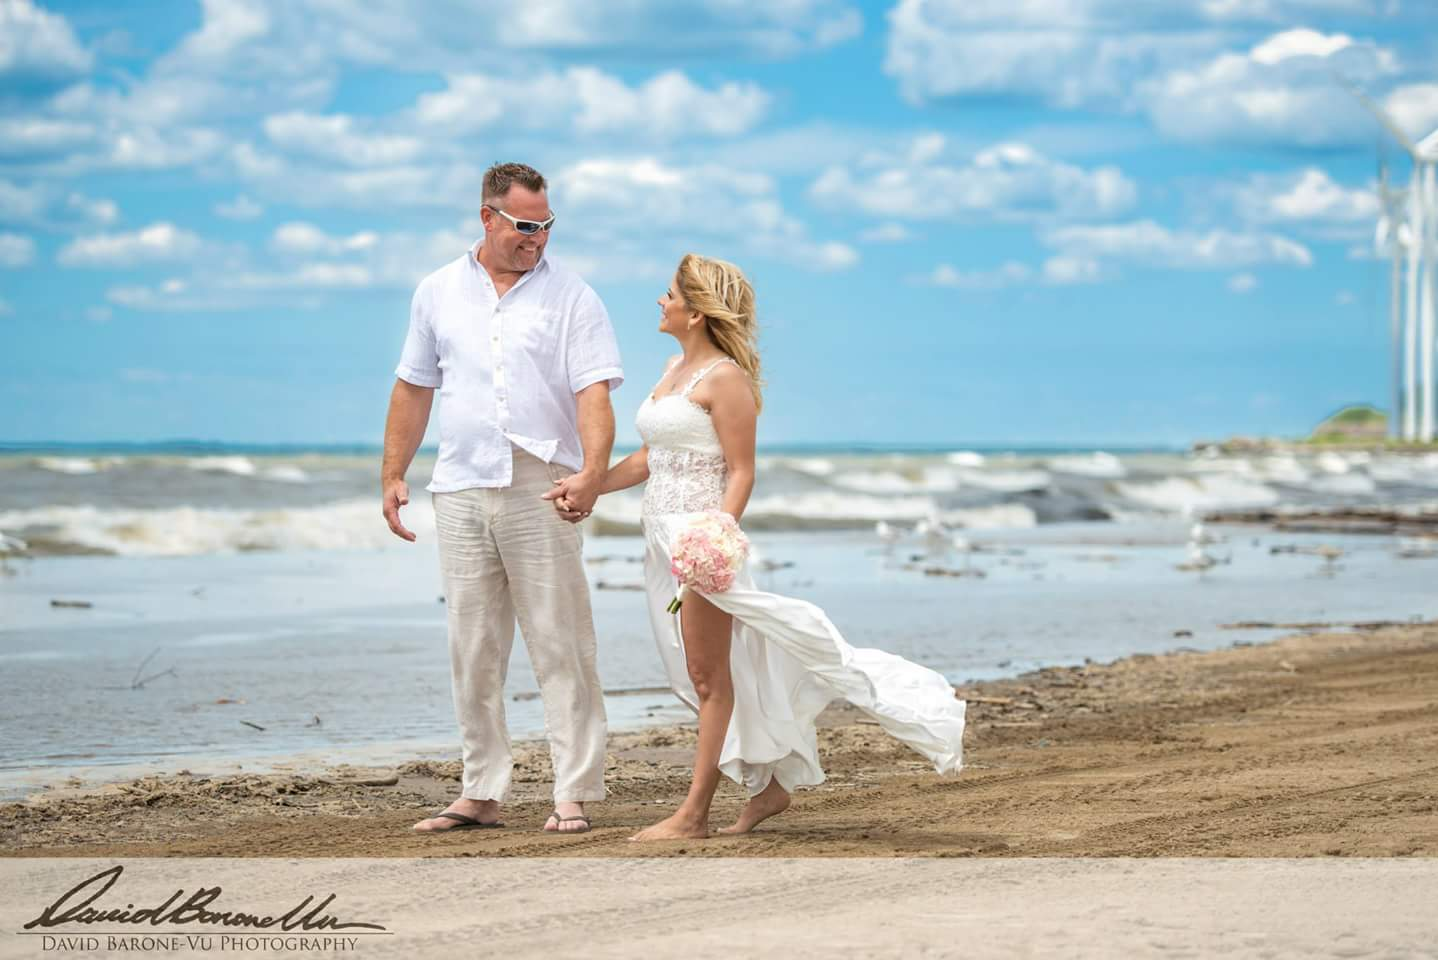 See Through Corset Bridal Wedding Dress